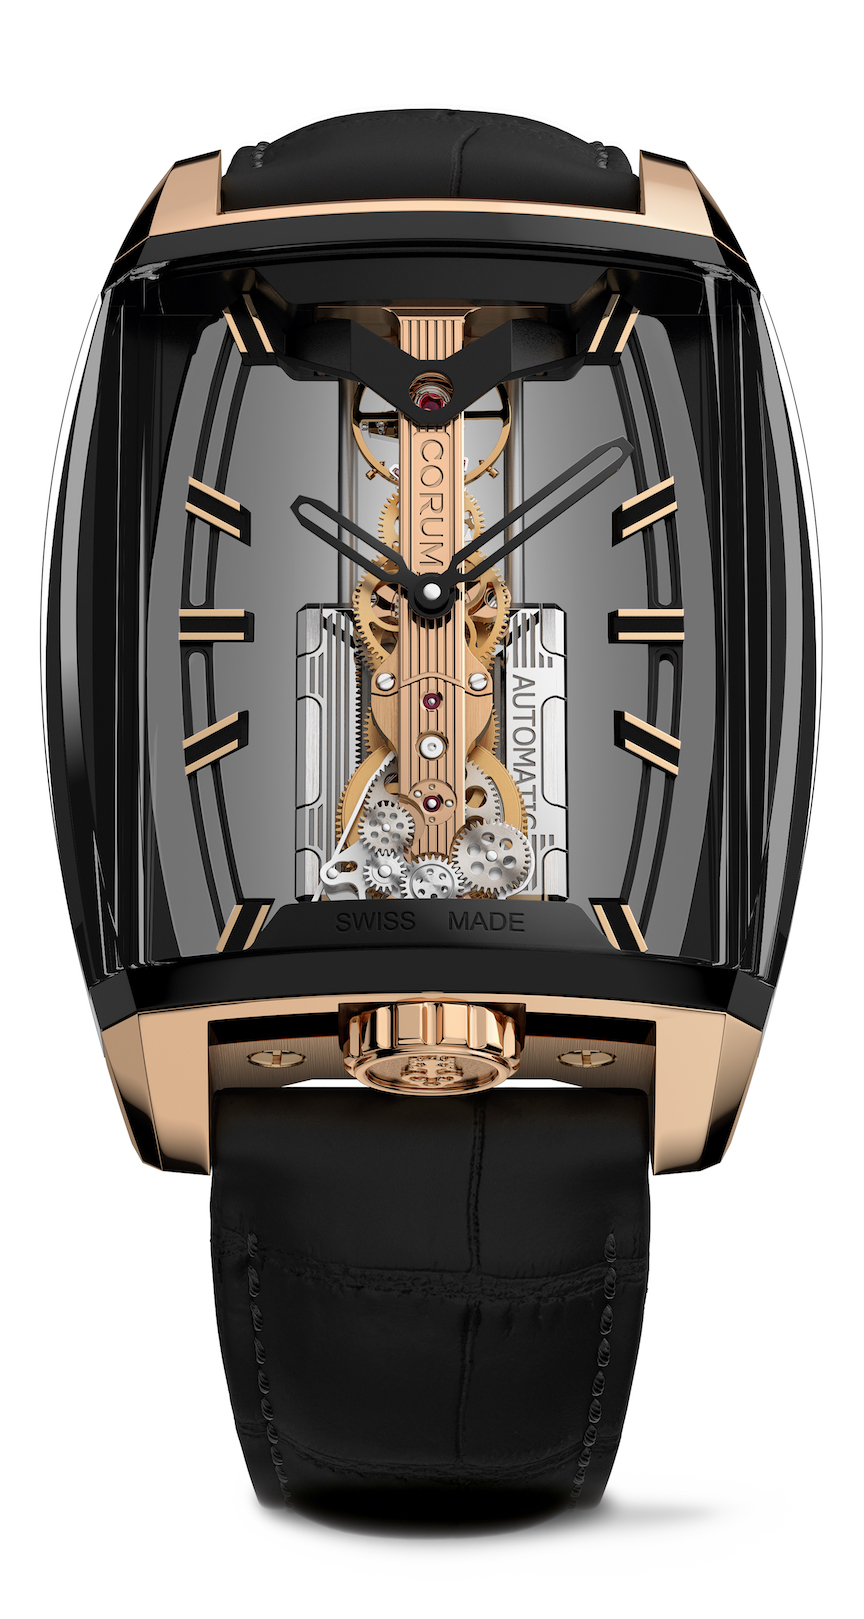 Corum Golden Bridge Automatic watch